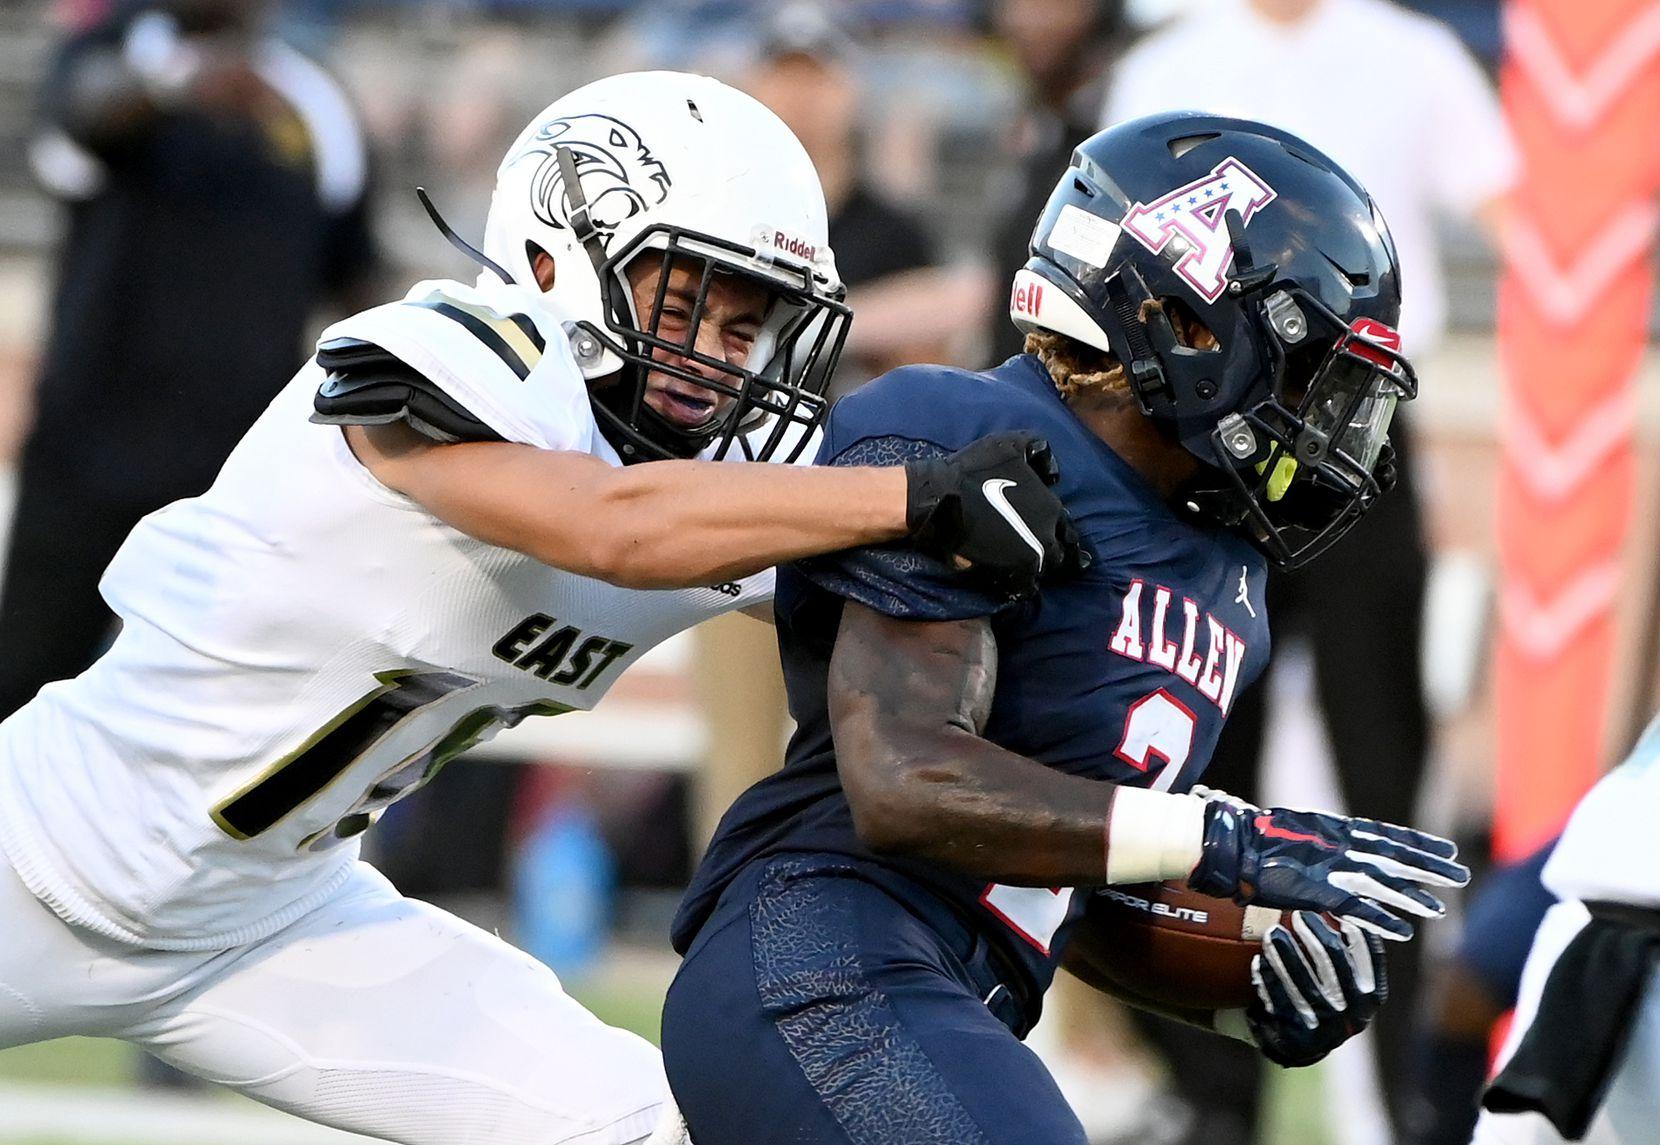 Plano East's Holden Stokes tackles Allen's Jaylen Jenkins (2) in the first half during a high school football game between Plano East and Allen, Friday, Aug. 27, 2021, in Allen, Texas. (Matt Strasen/Special Contributor)